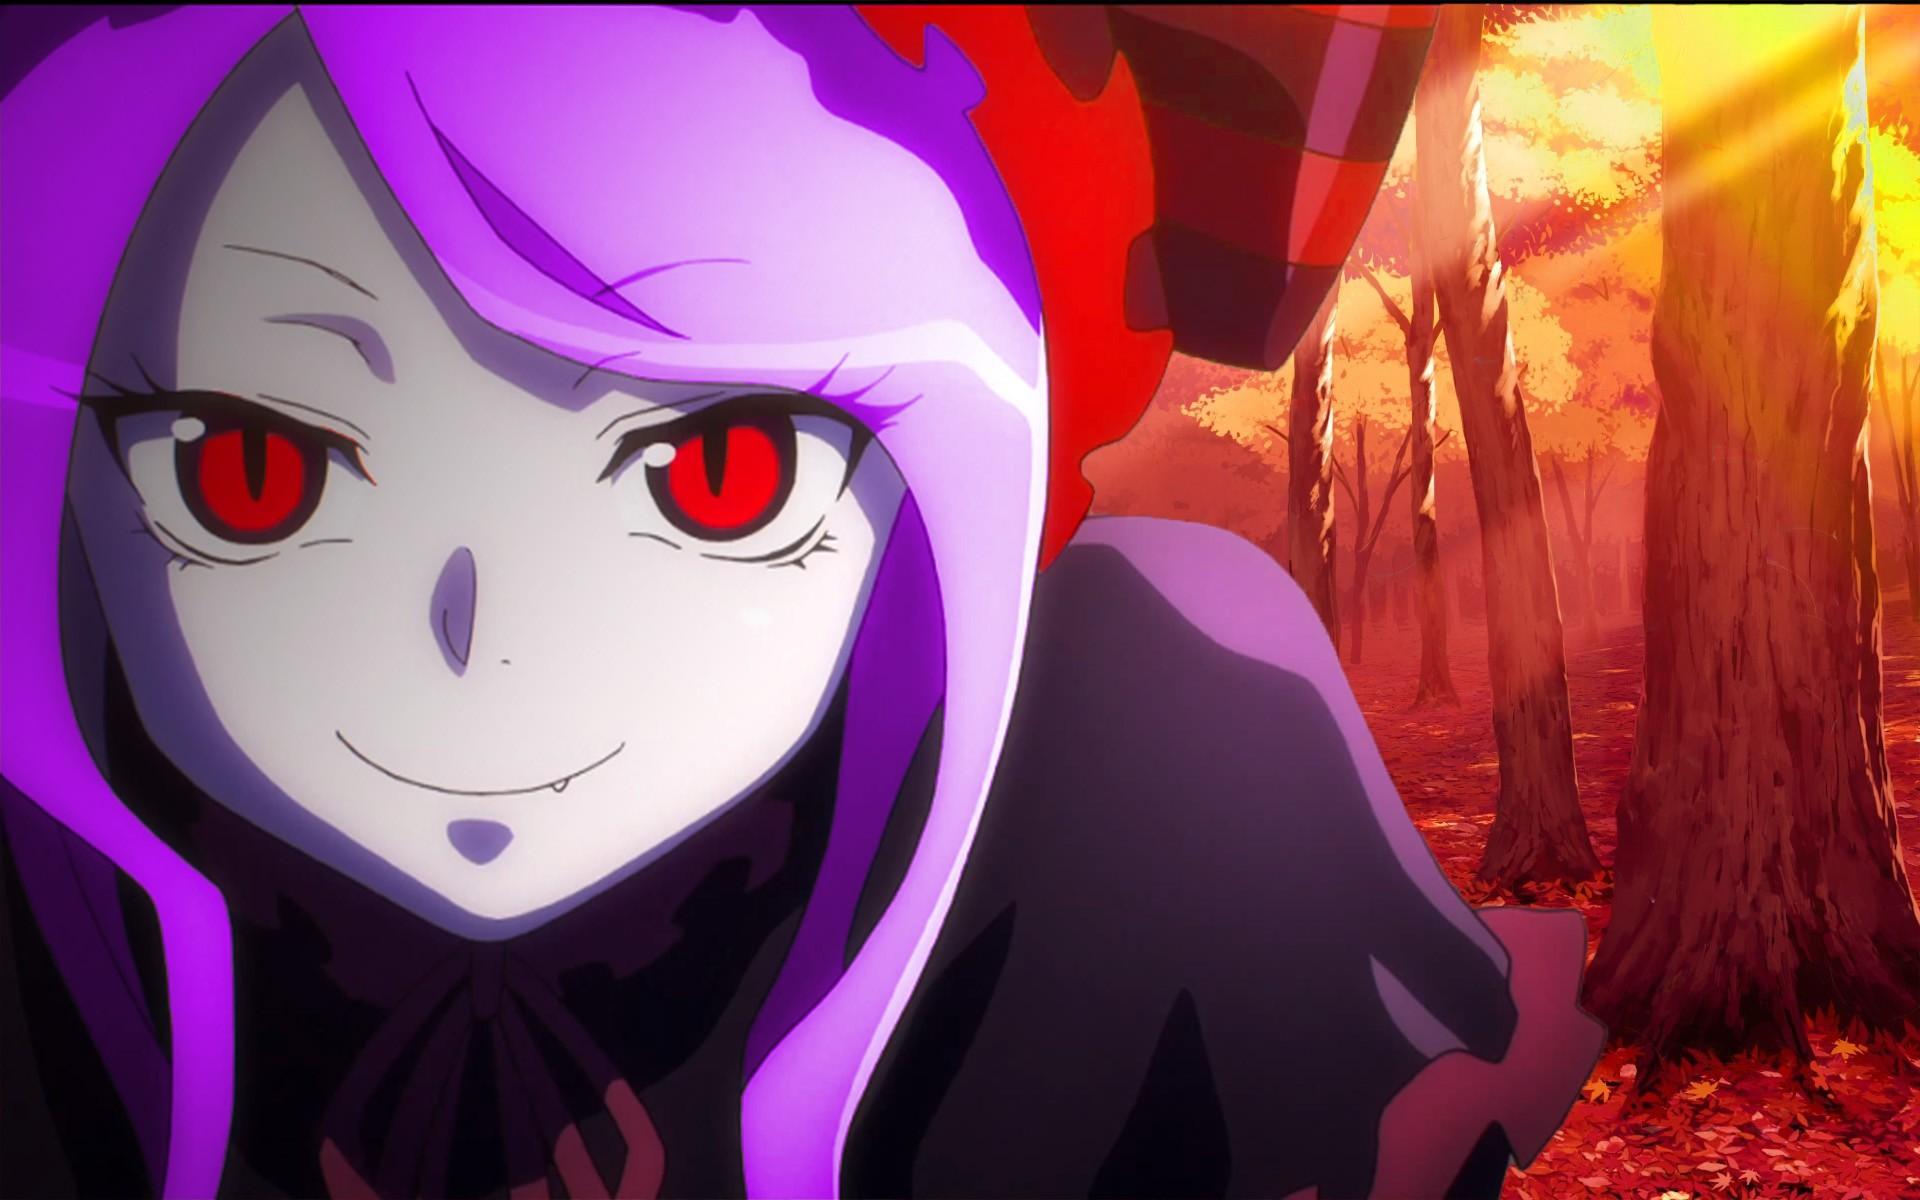 Shalltear Overlord Anime Anime Girls Anime Shalltear Bloodfallen Wallpaper Resolution 1920x1200 Id 649725 Wallha Com